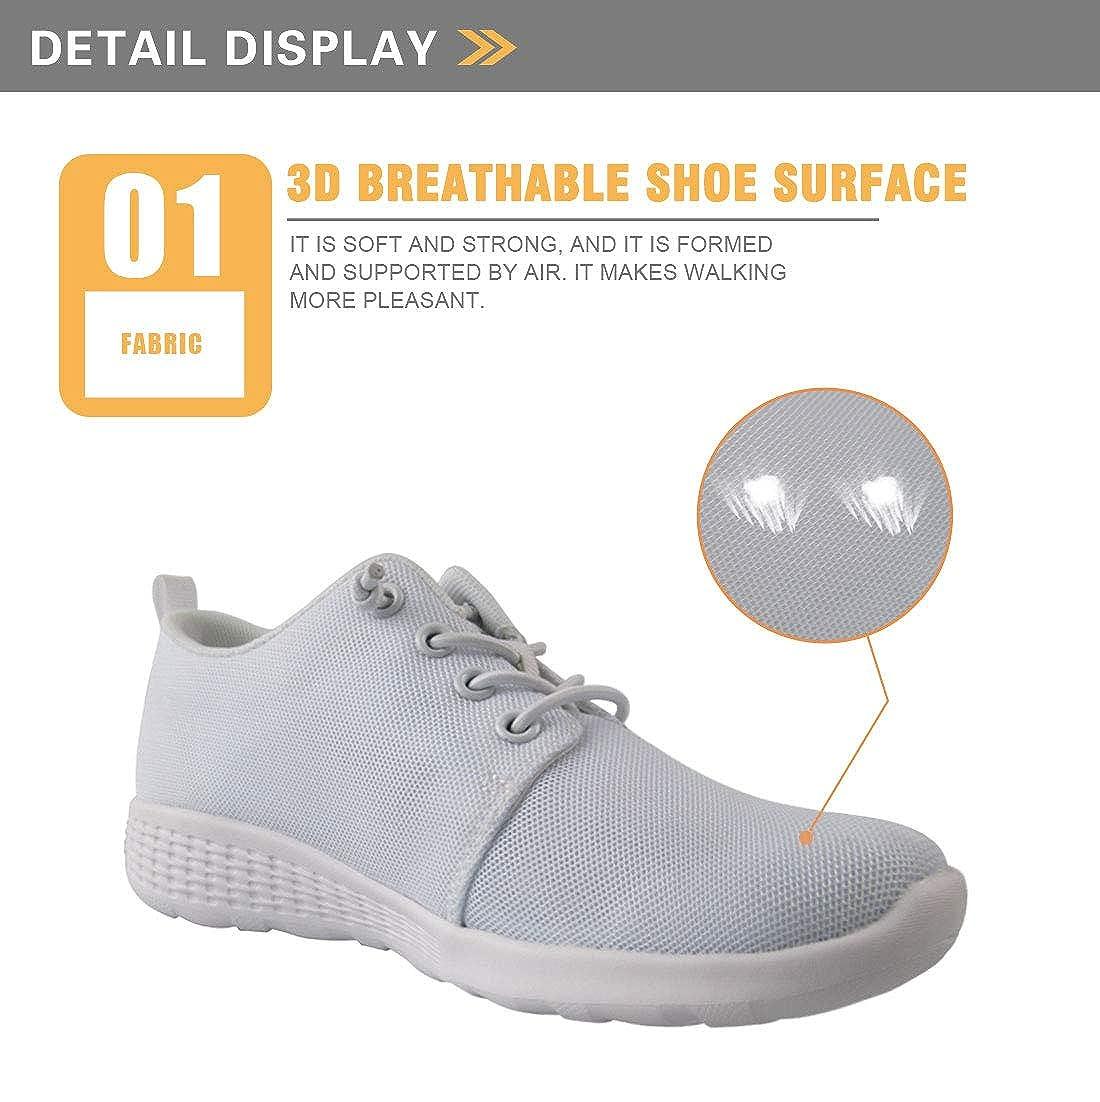 Dellukee Wave Water Shoes for Women Men Pug White Quick Dry Aqua Barefoot for Swim Surf Beach